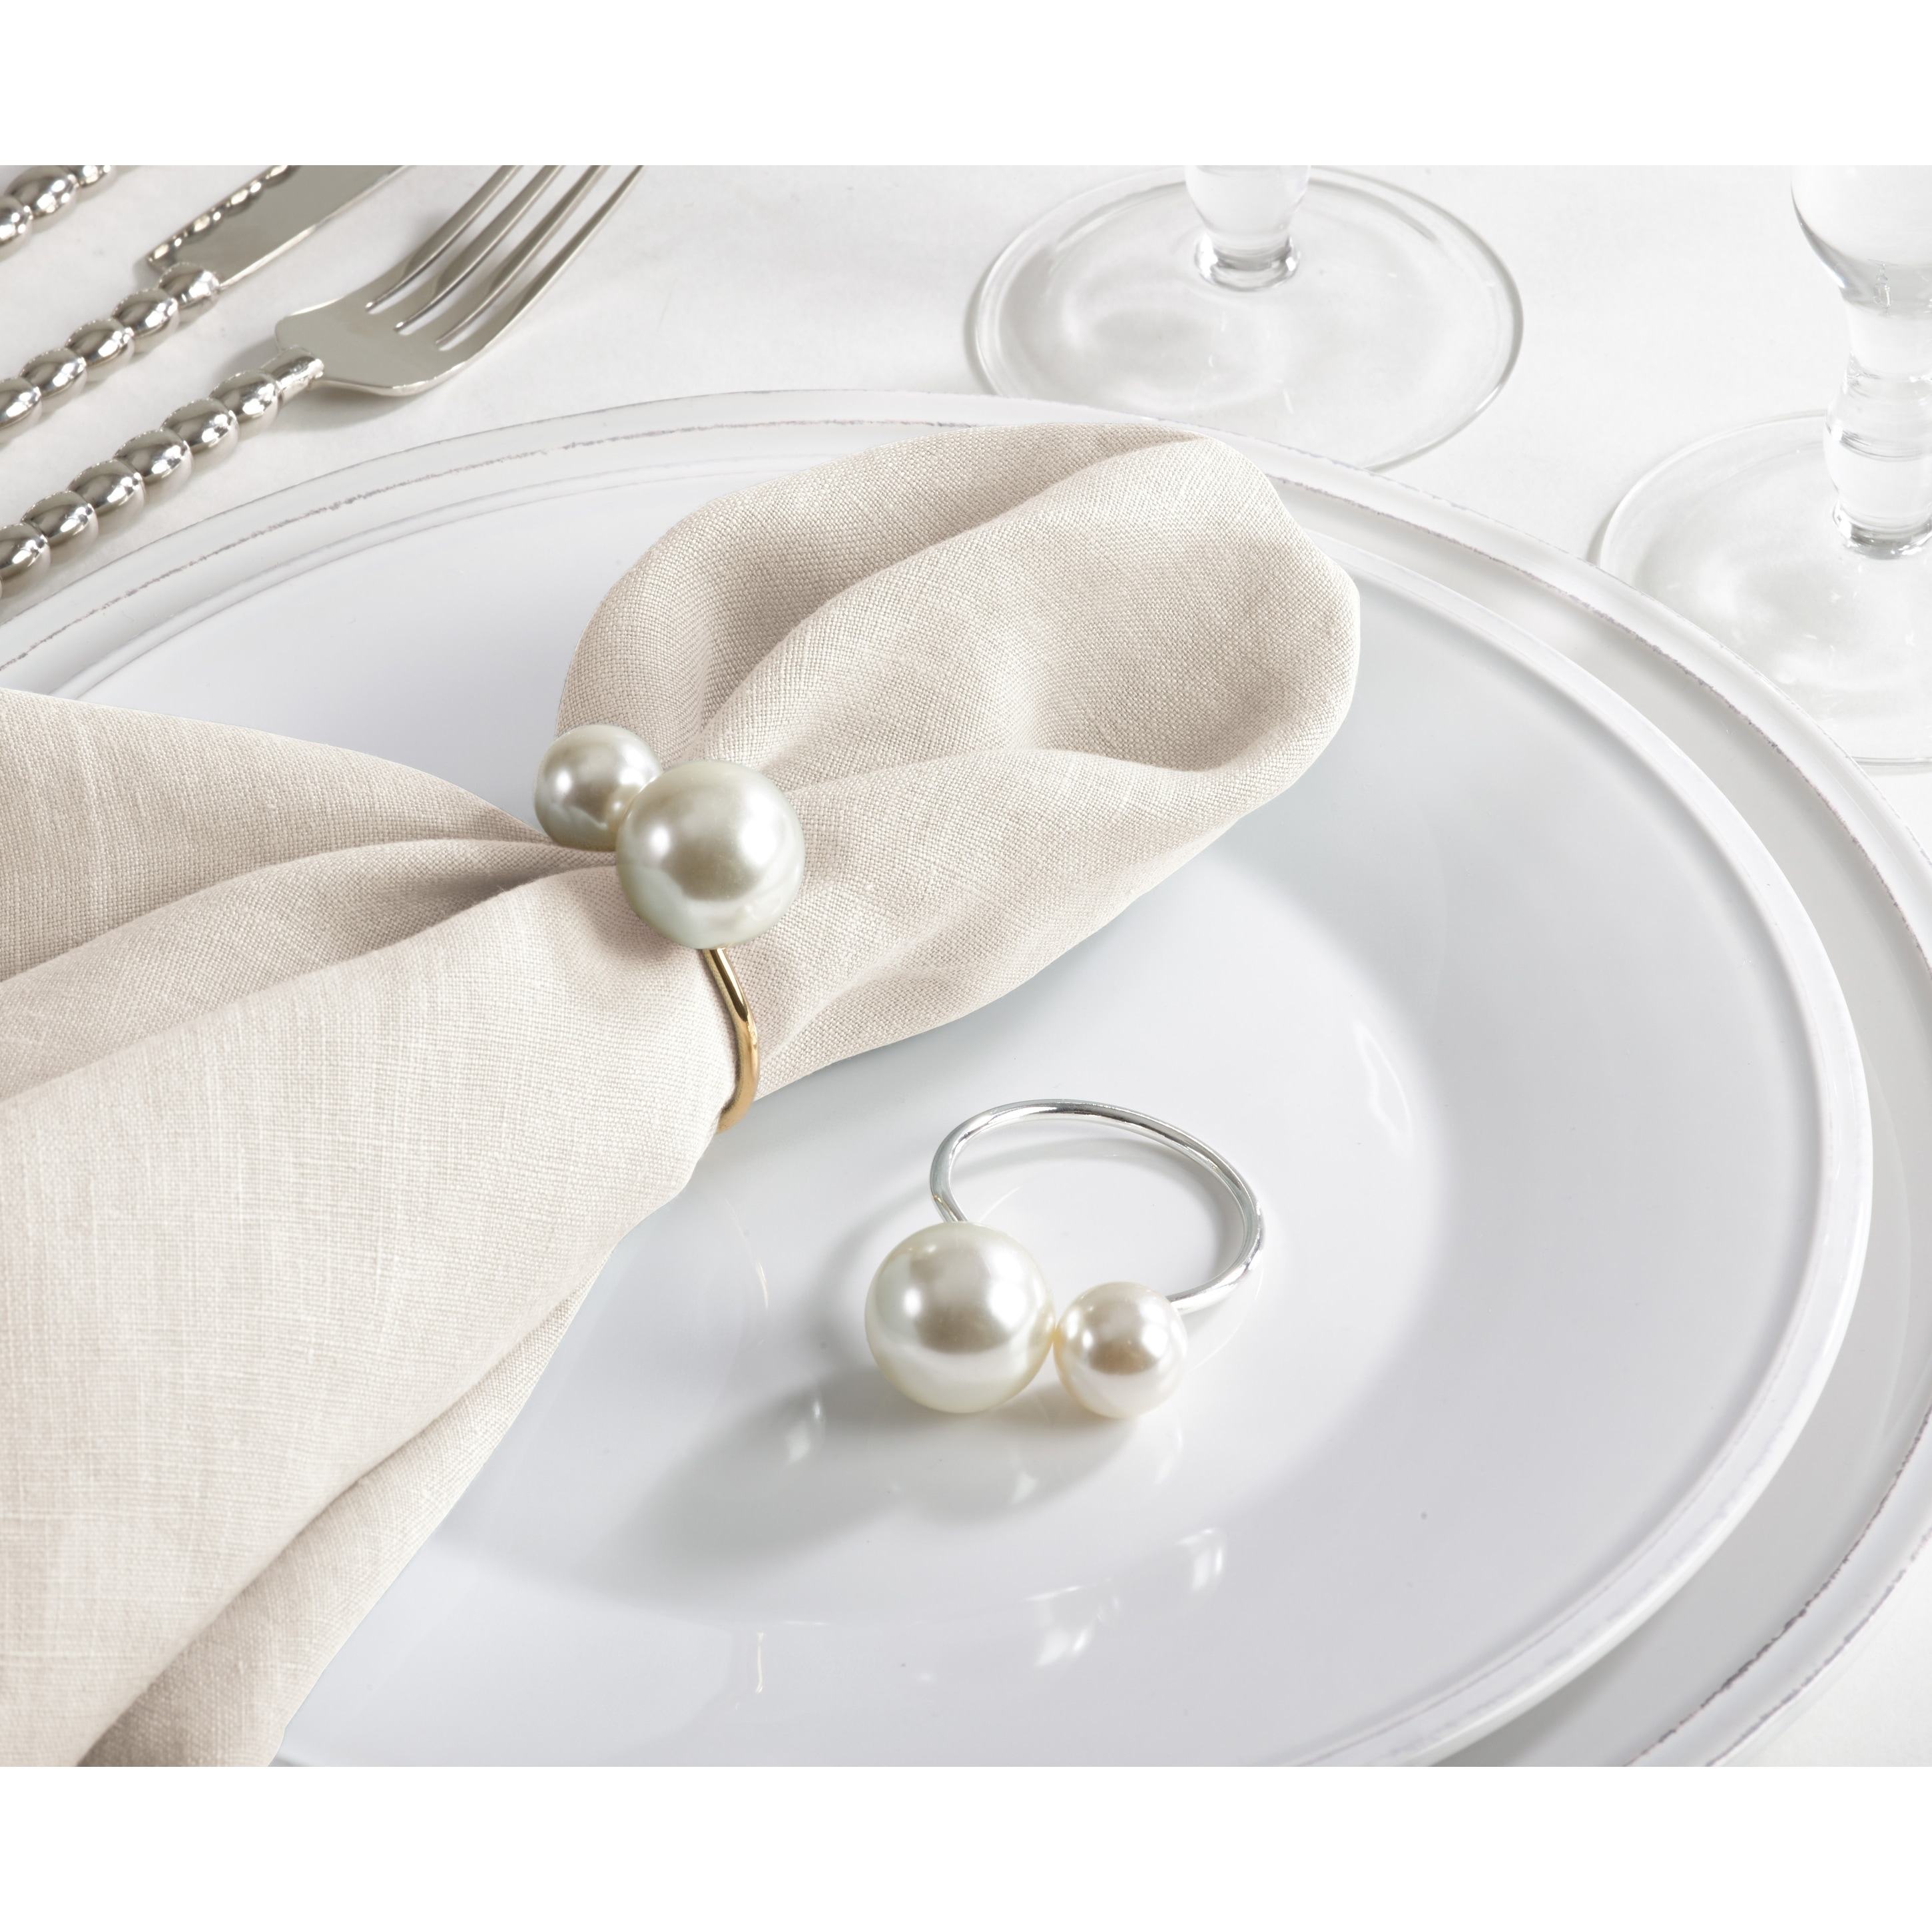 Napkin Rings Napkin Ring Artificial Pearl Napkin Buckle Metal Napkin Holder For Wedding Hotel Dinning Table Decoration Home Hyundai Lighting Com Mk